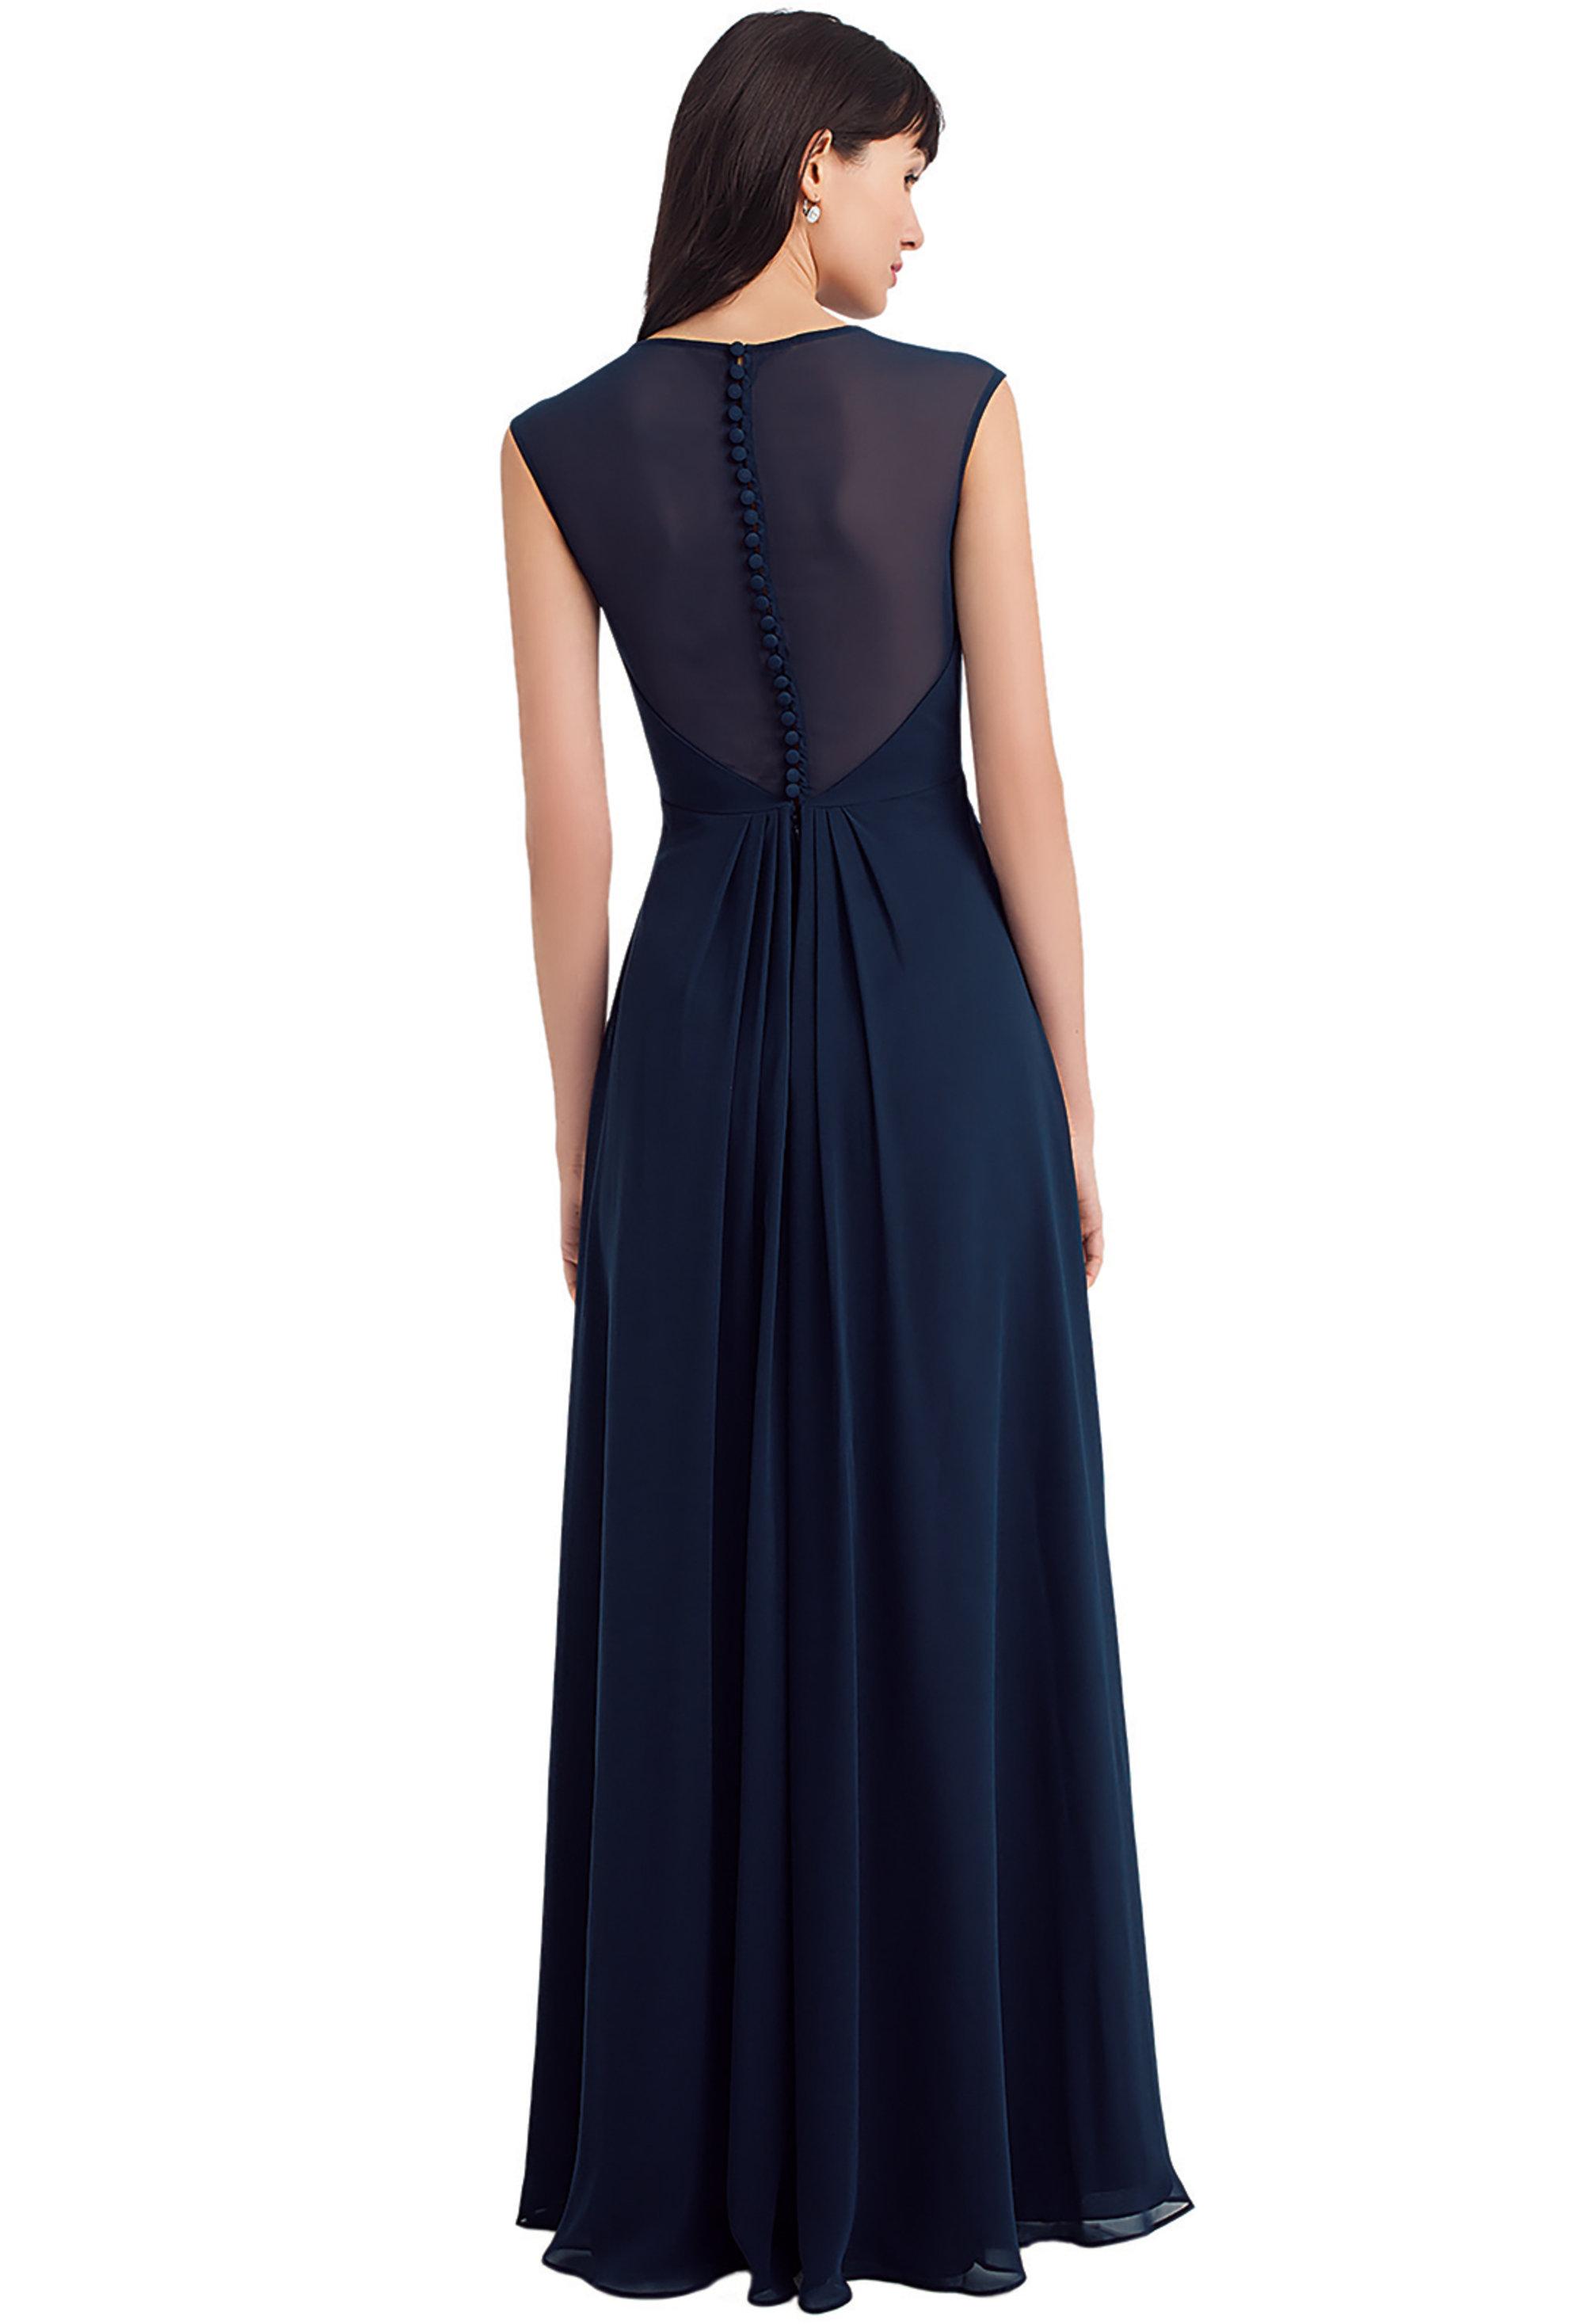 Bill Levkoff NAVY Chiffon Sweetheart A-line gown, $220.00 Back